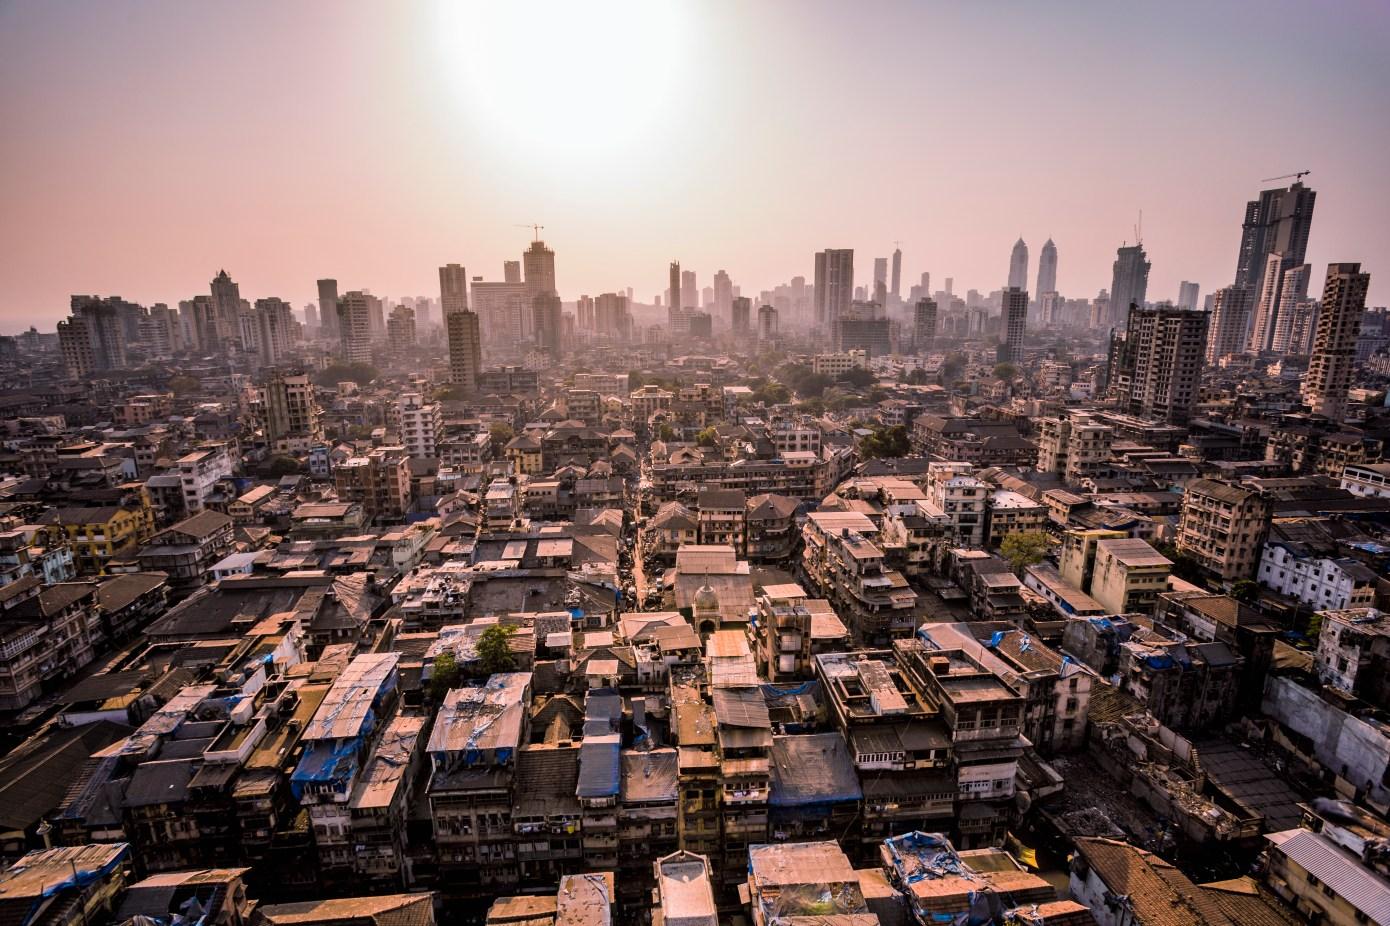 FloBiz raises M to scale small businesses in India